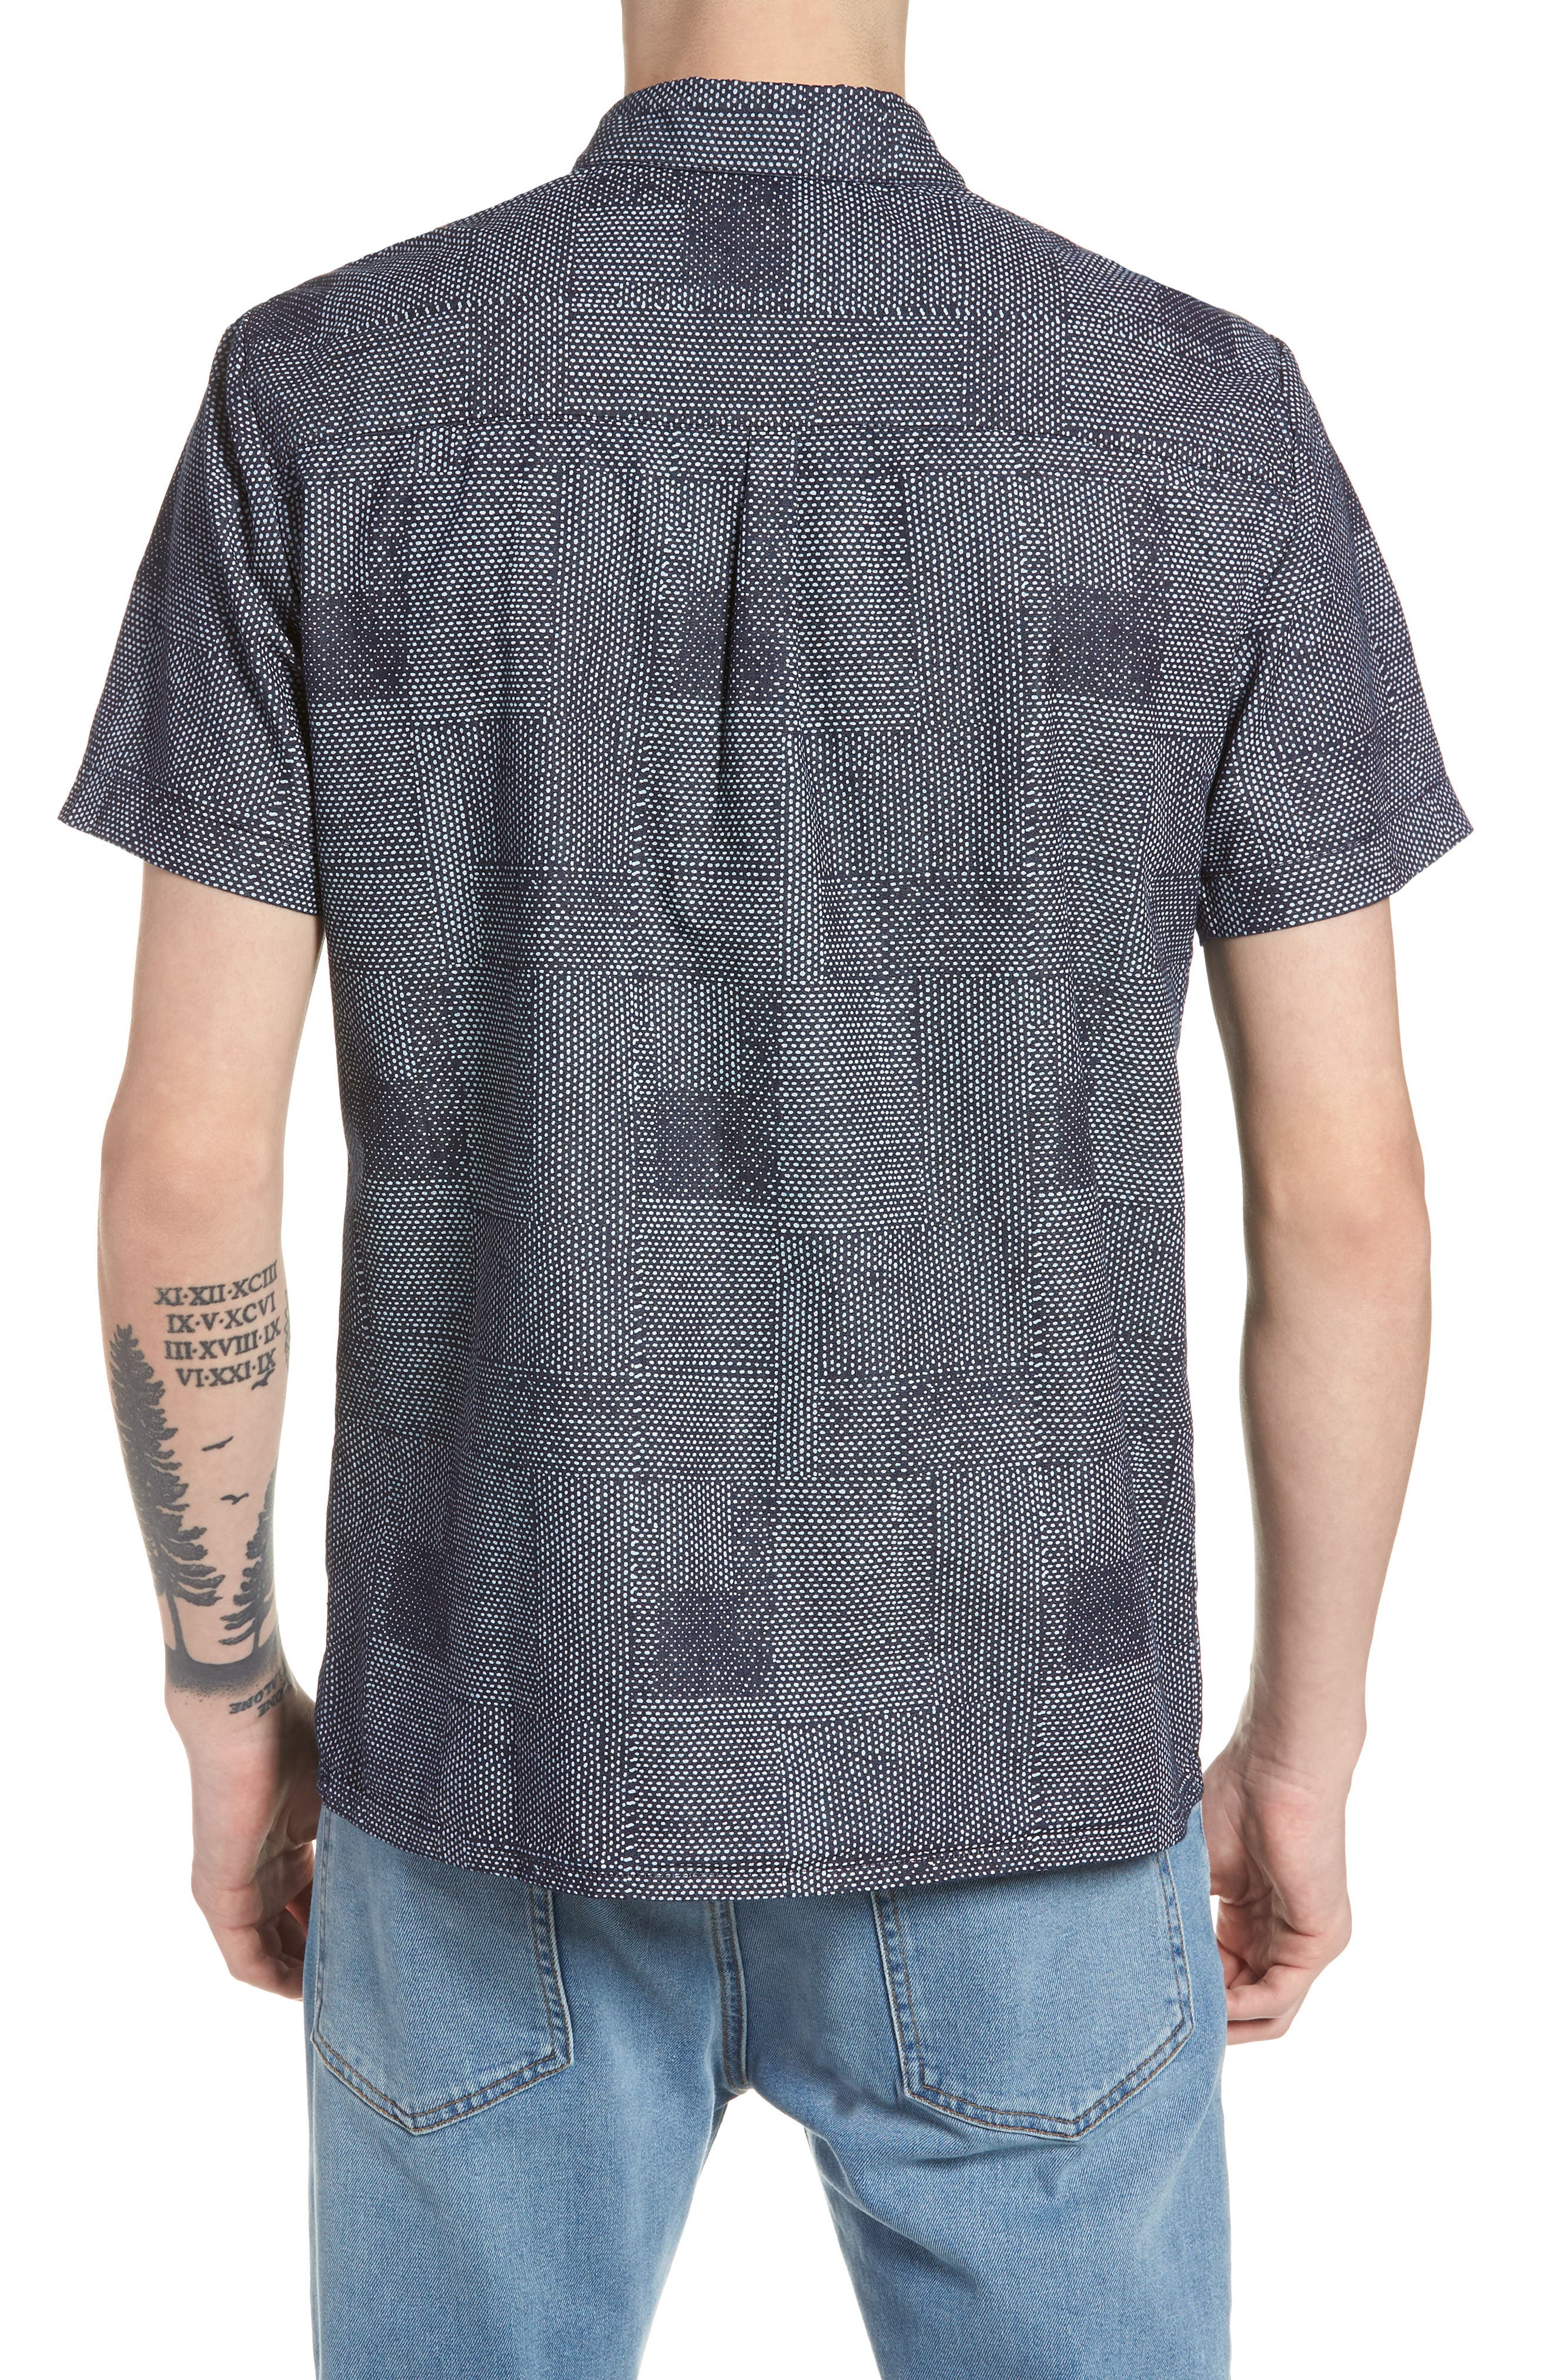 Dotpatch Woven Shirt,                             Alternate thumbnail 3, color,                             Indigo